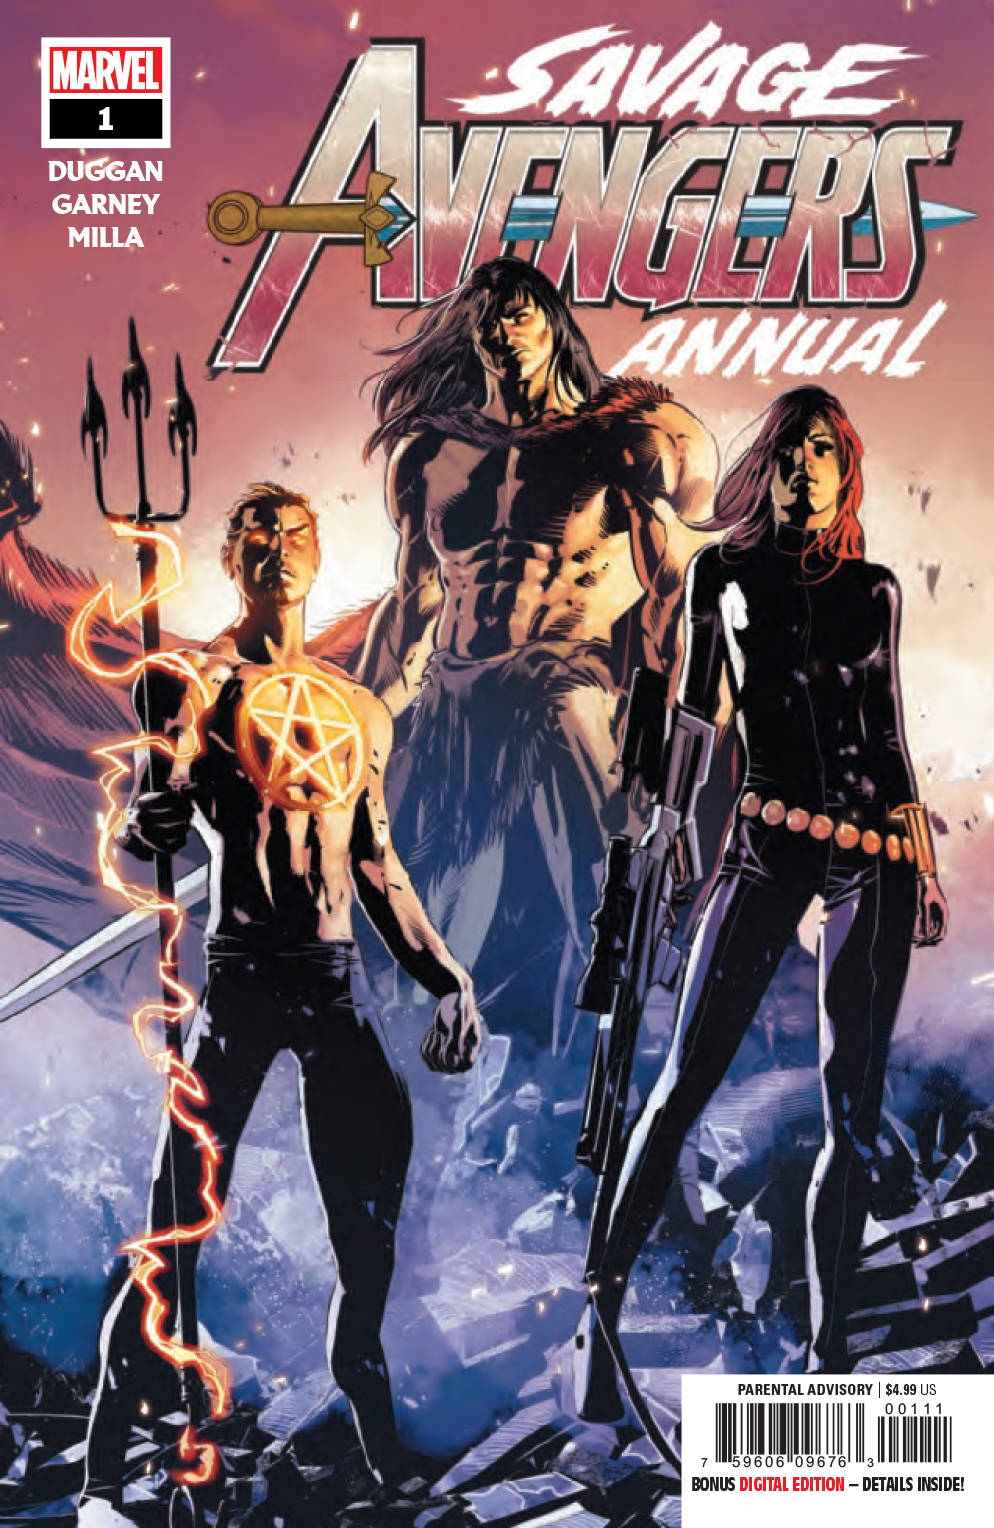 Savage Avengers Annual #1 (2019)